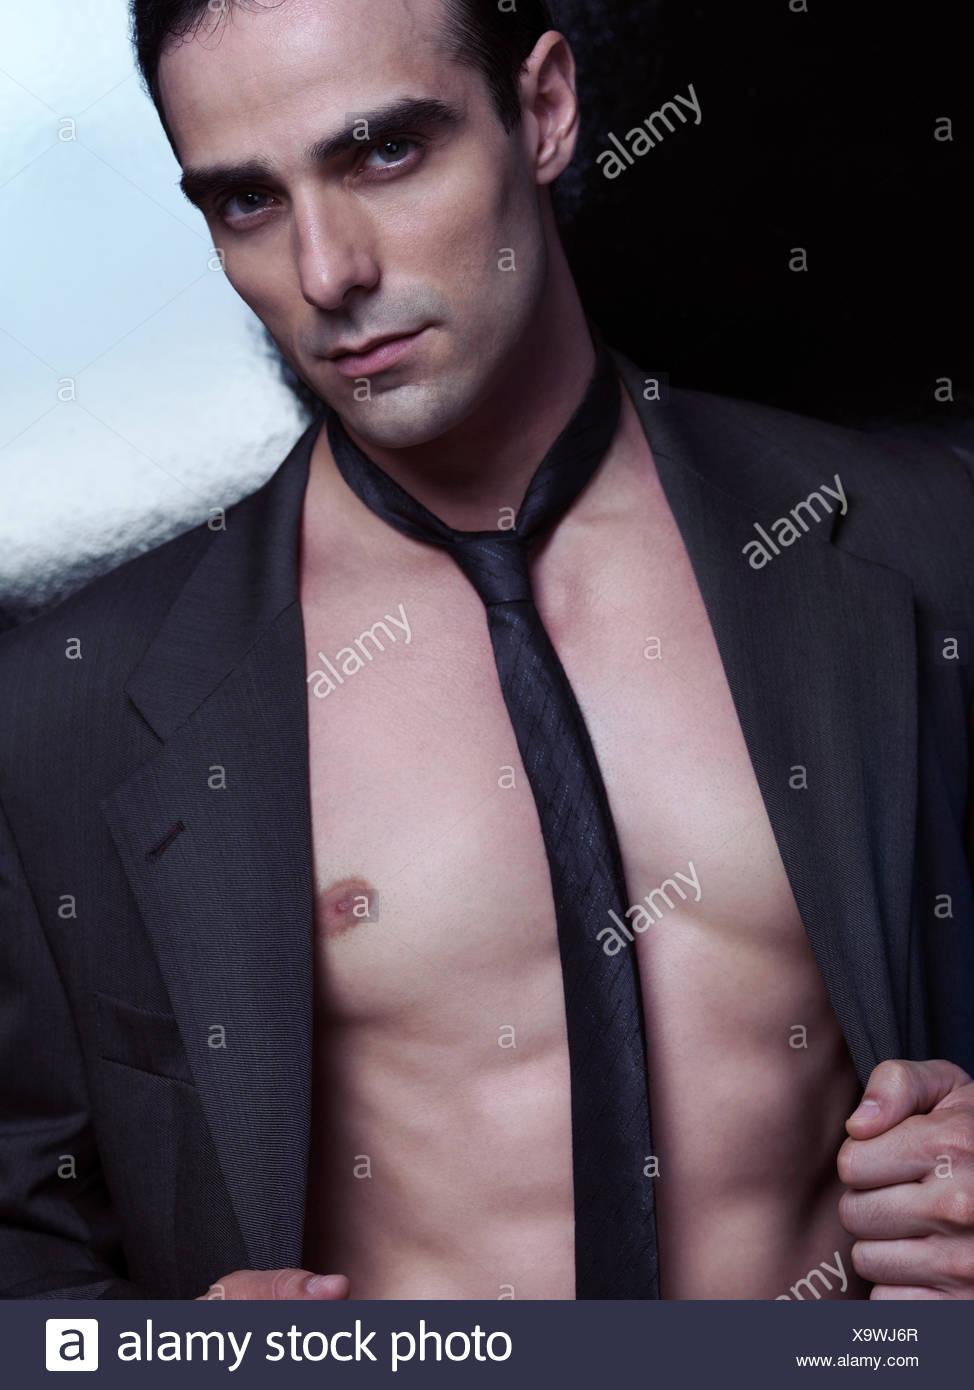 Man Not Woman Muscular Jacket Photos amp; 6qxrR68wp